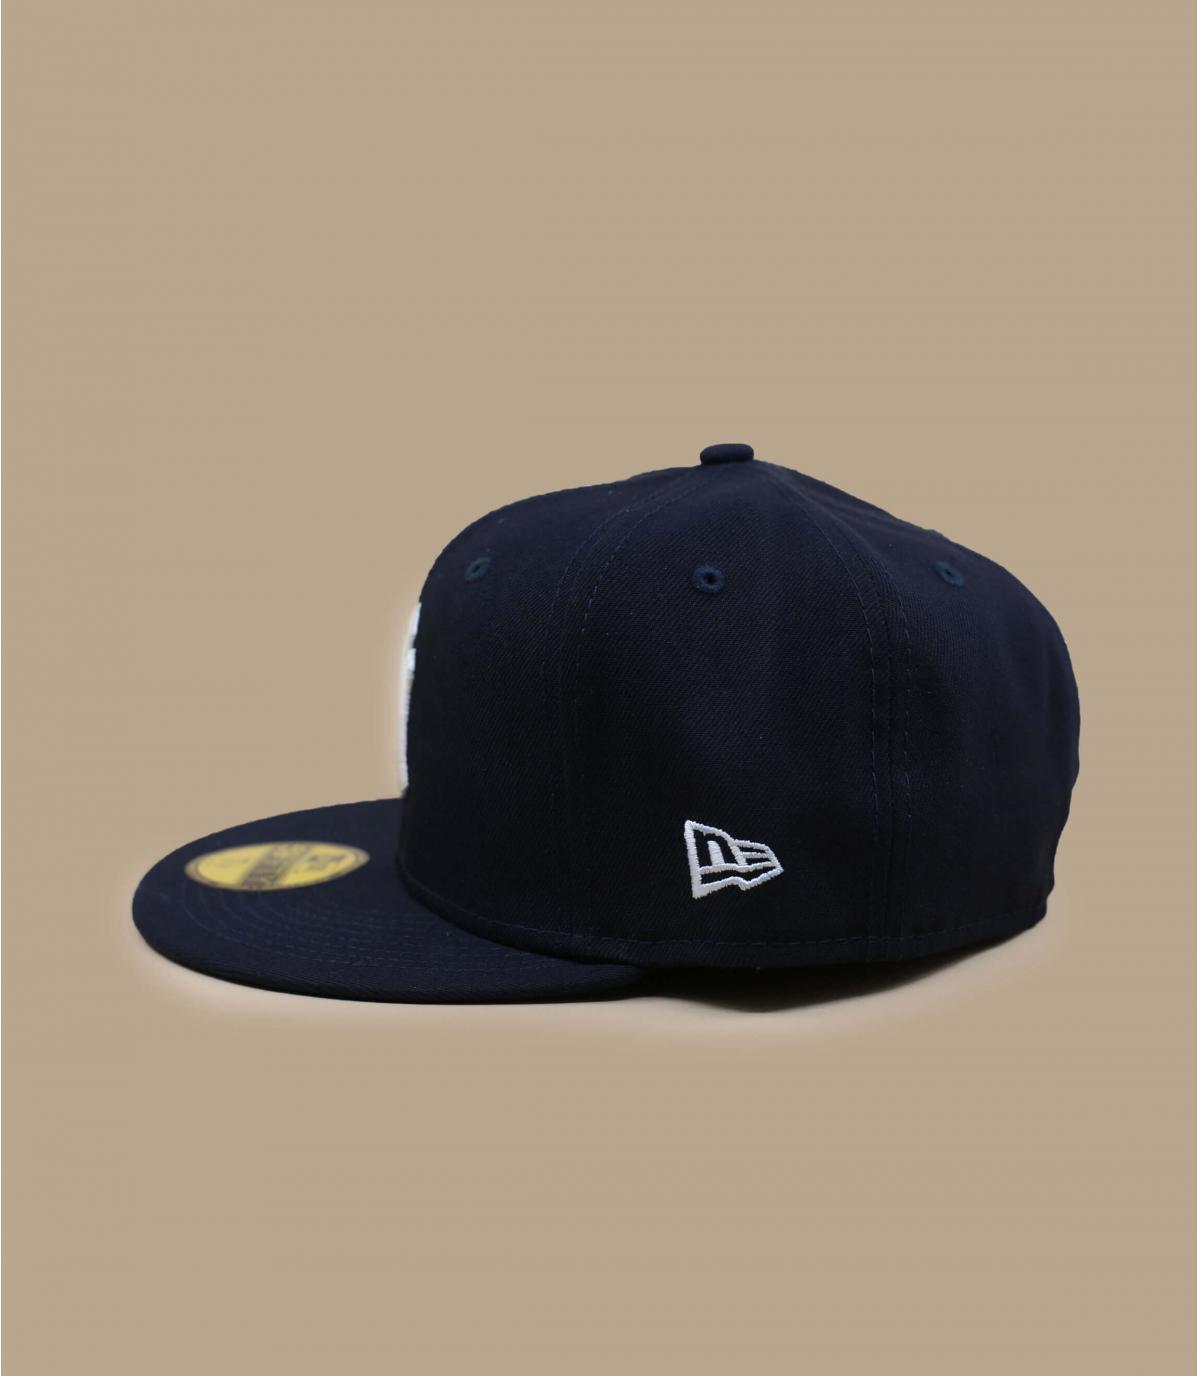 Dettagli MLB AC Perf 5950 New York Yankees - image 2